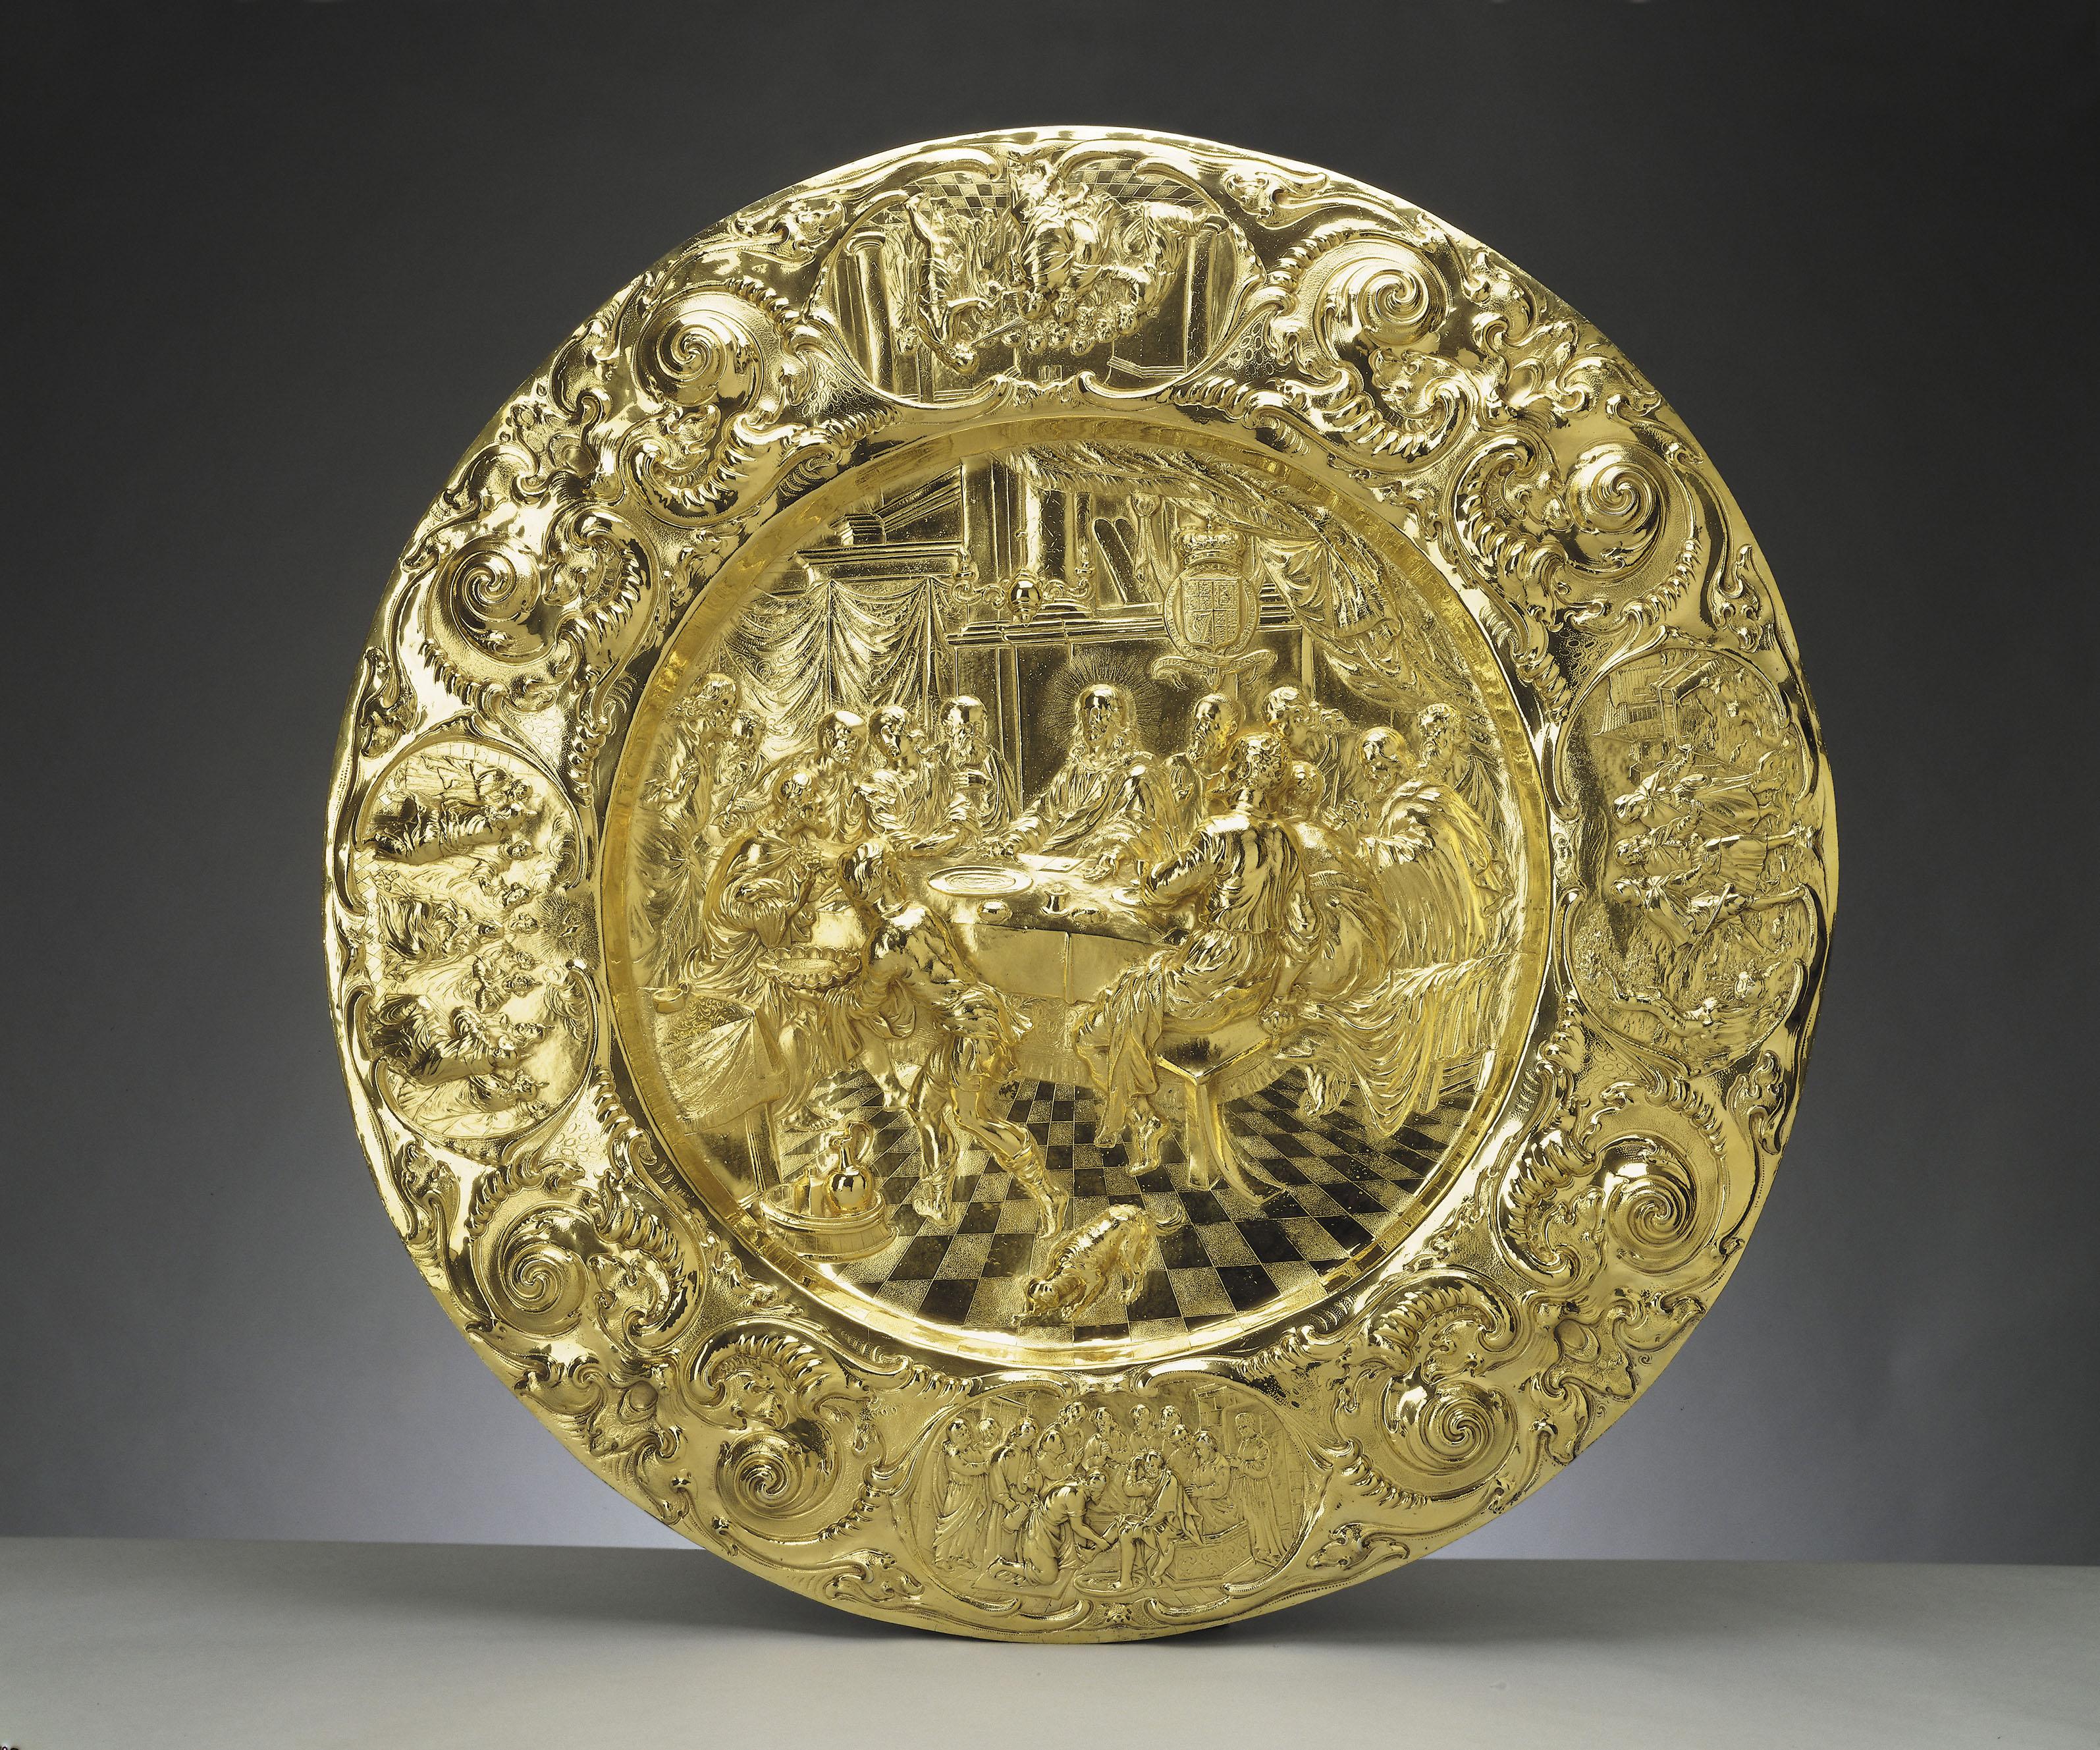 Henry Greenway, Alms dish, c.1660-61